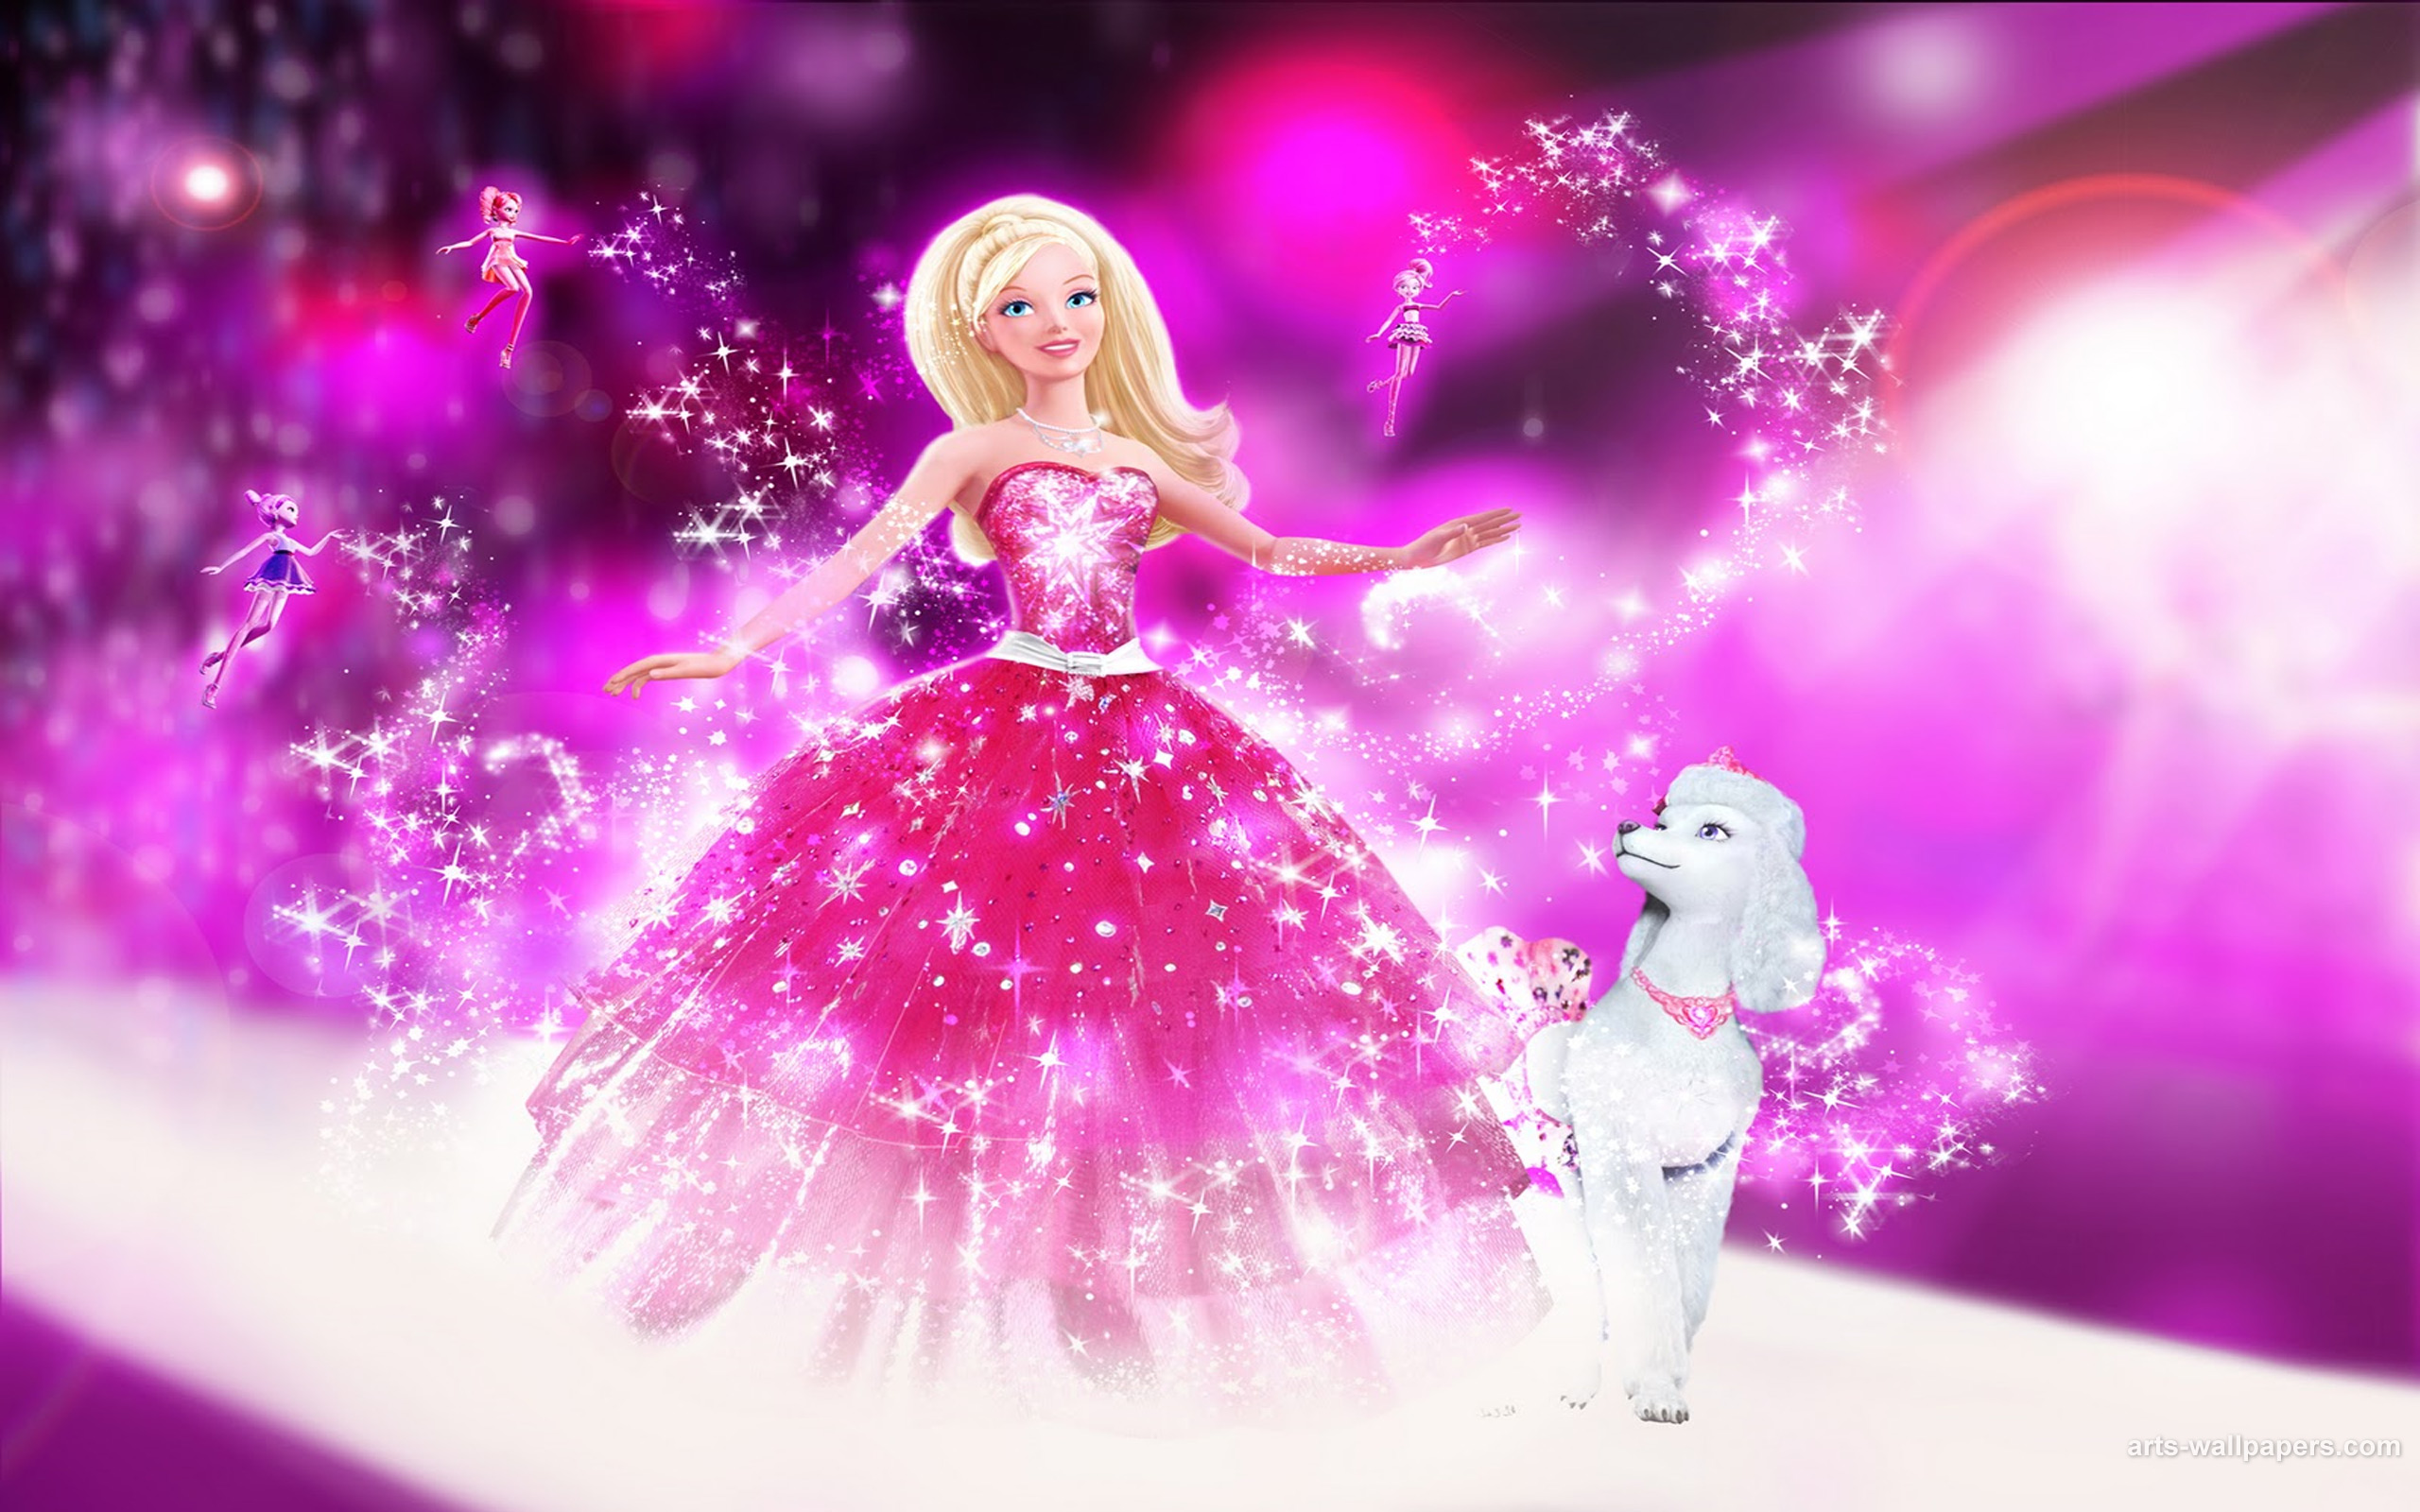 Barbie Wallpaper HD Widescreen 1080p Barbie Wallpapers 2560x1600